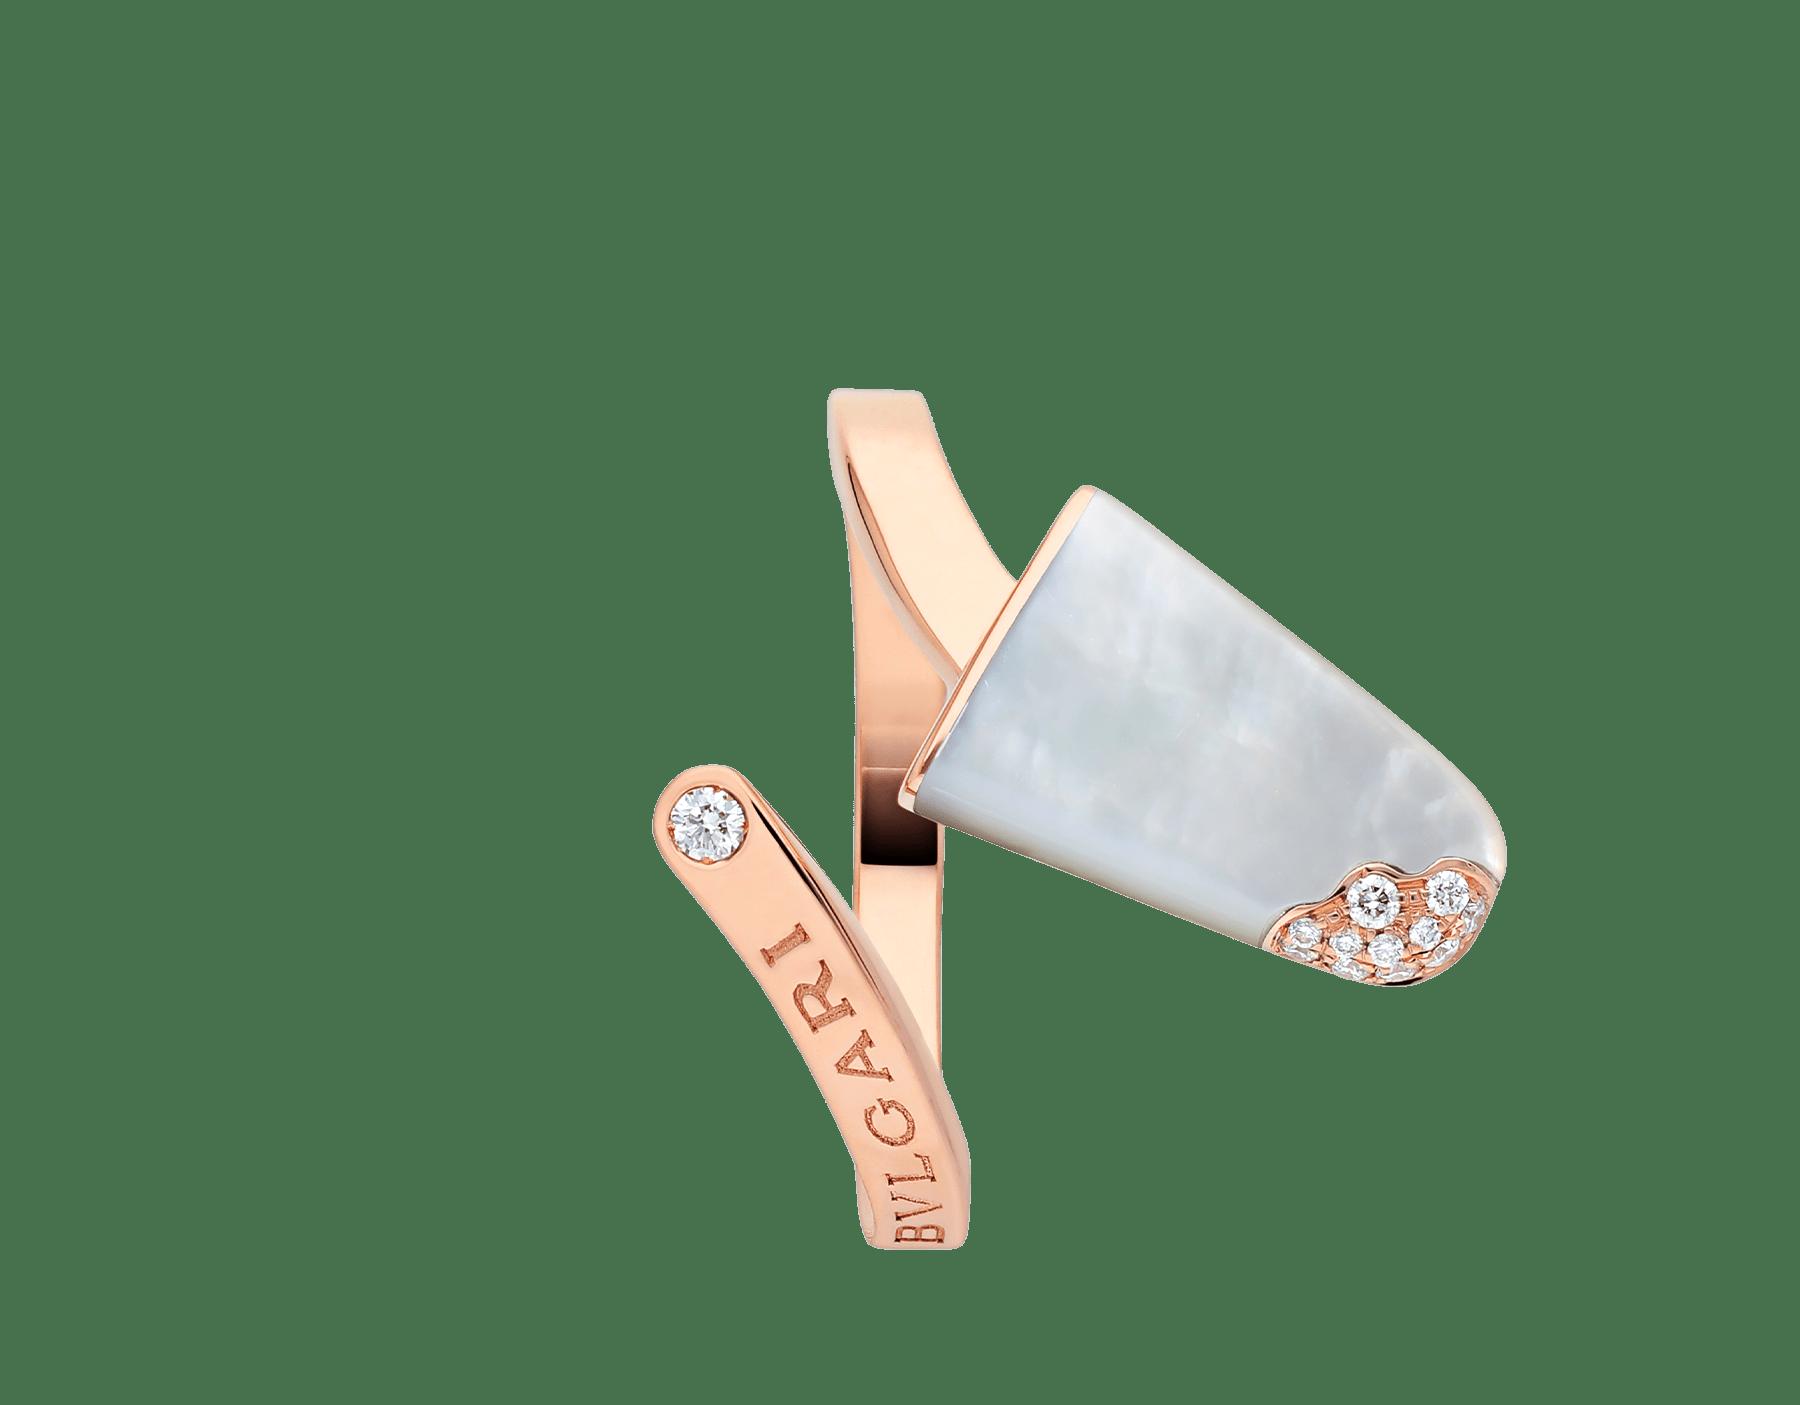 Bague BVLGARI BVLGARI Gelati en or rose 18K avec nacre et pavé diamants AN858014 image 3